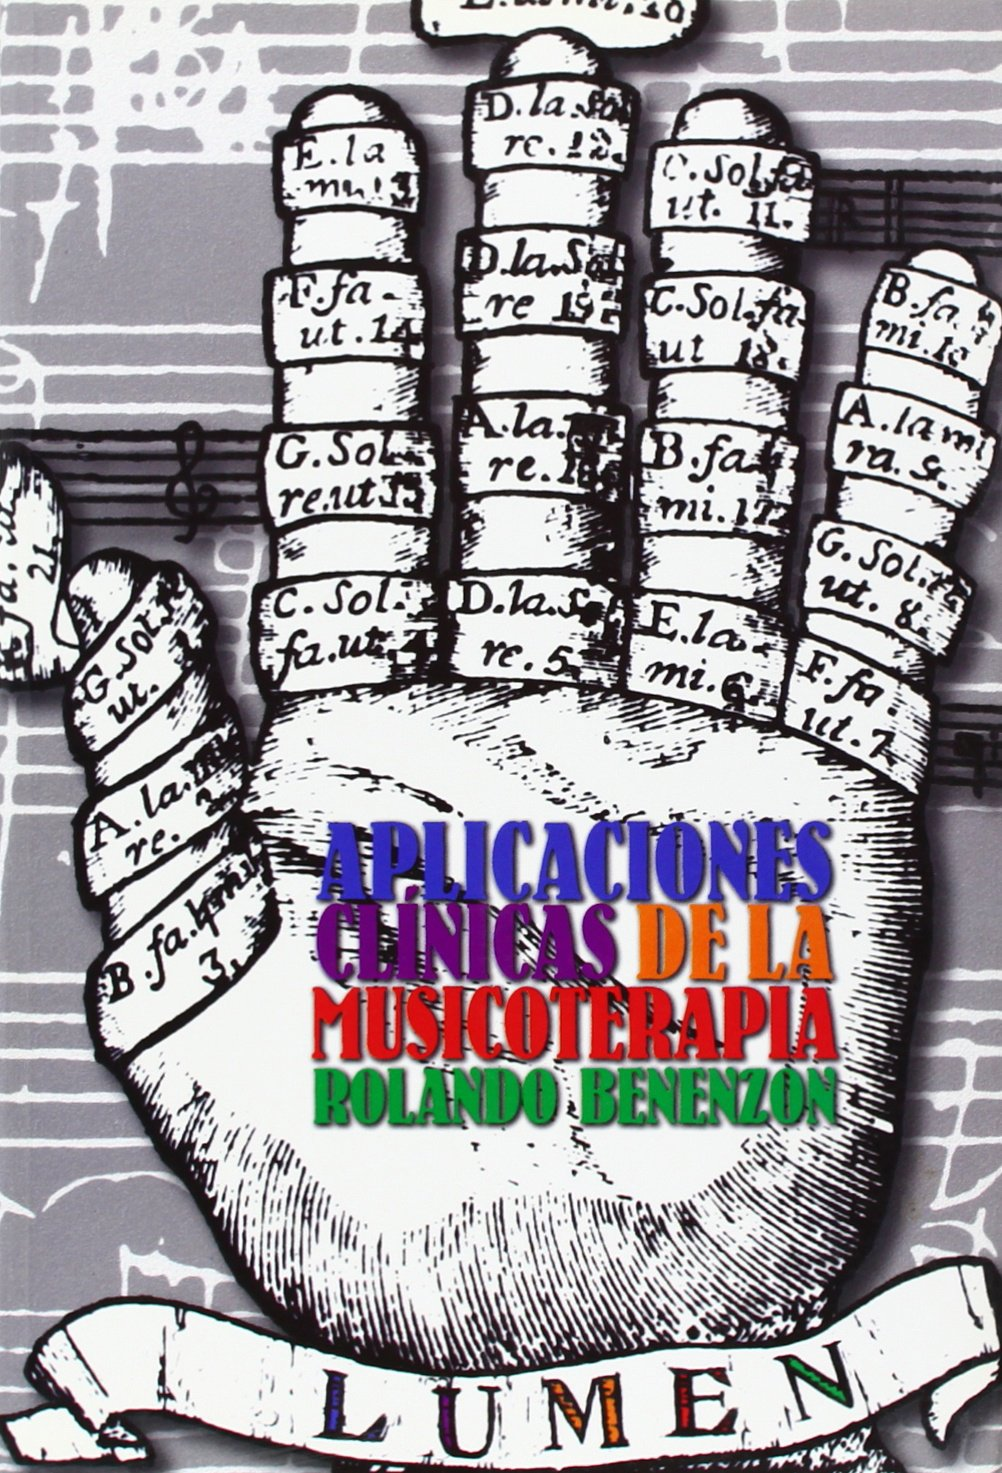 Aplicaciones Clinicas de la musicoterapia